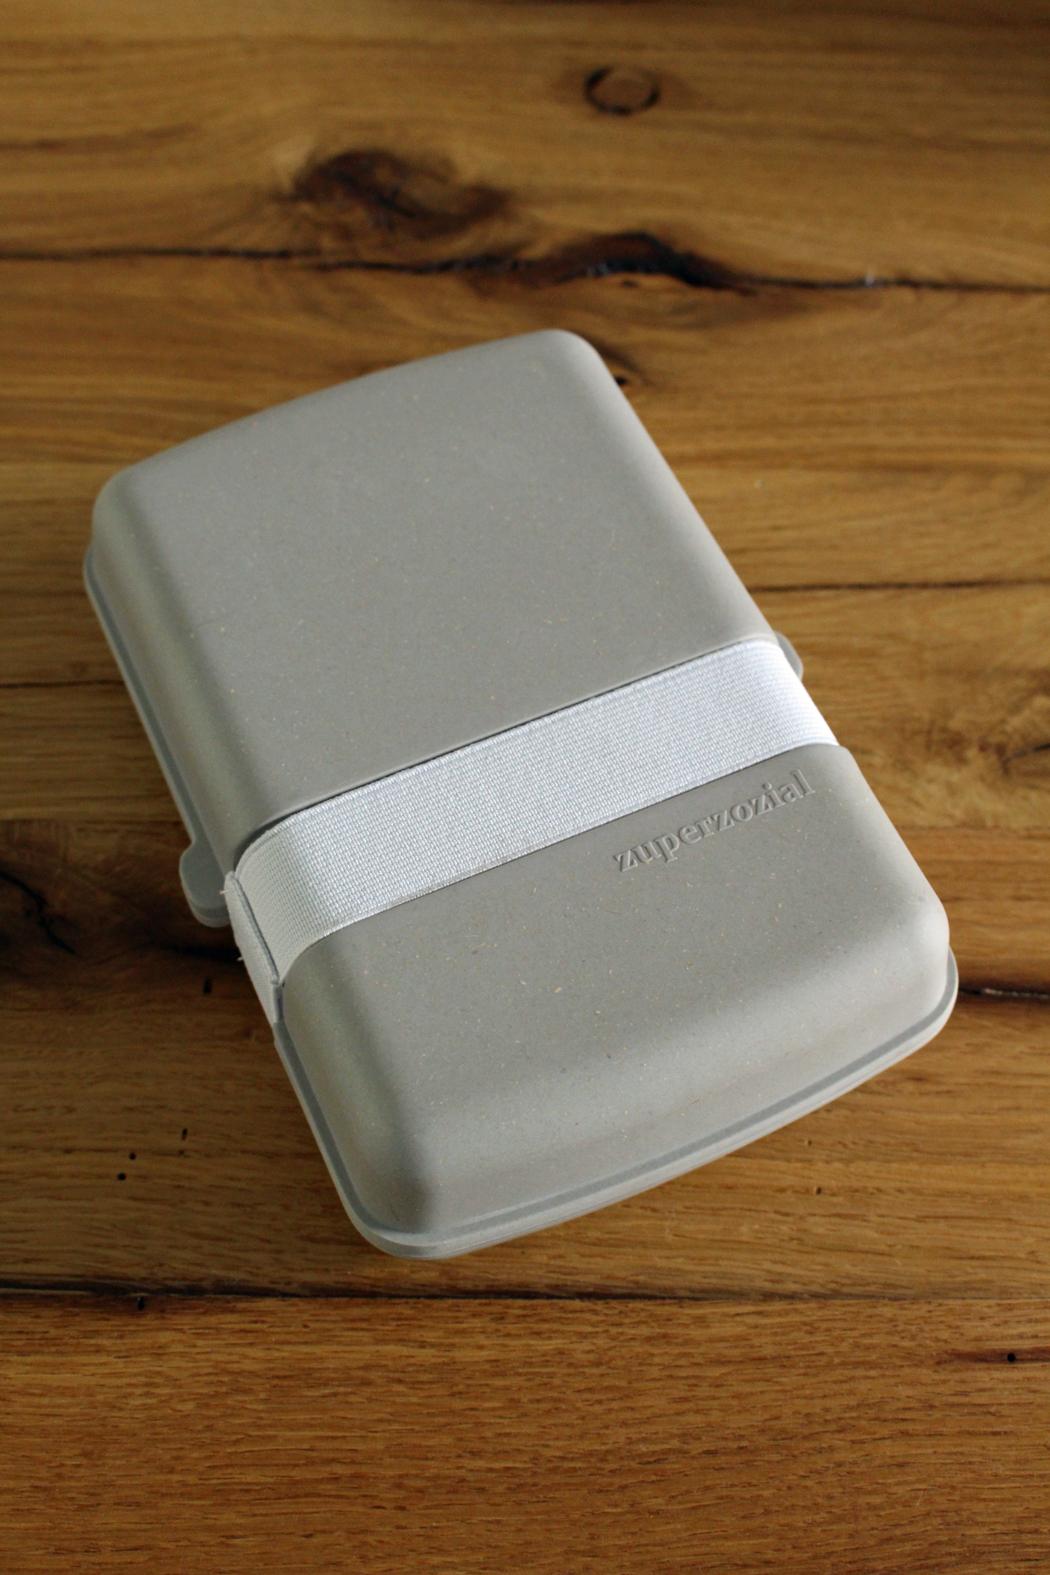 Zuperzozial Lunchbox1